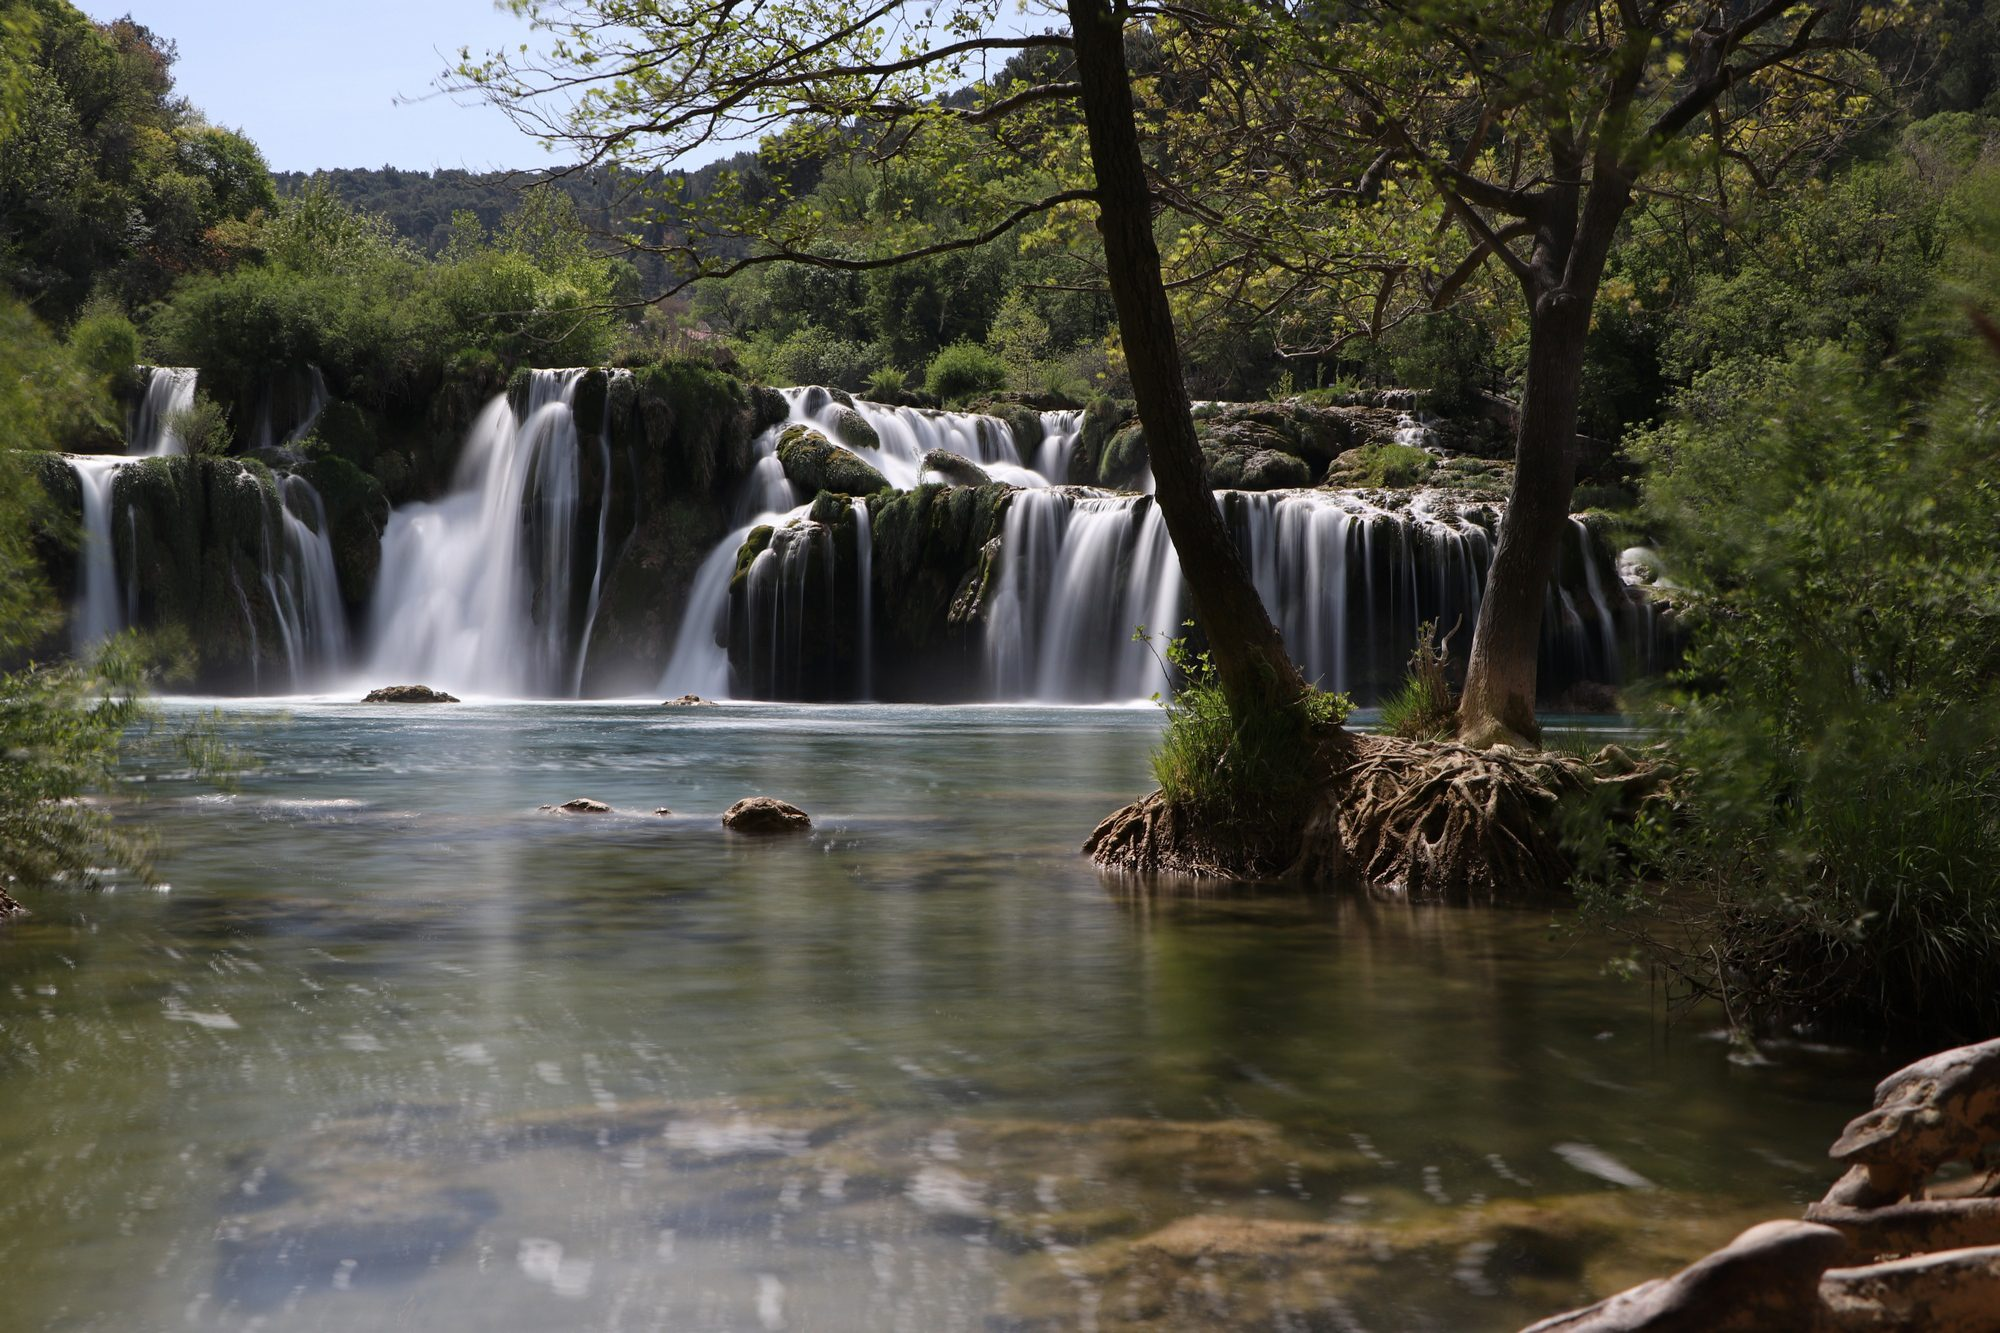 Wasserfall Skradinski buk im Krka-Nationalpark